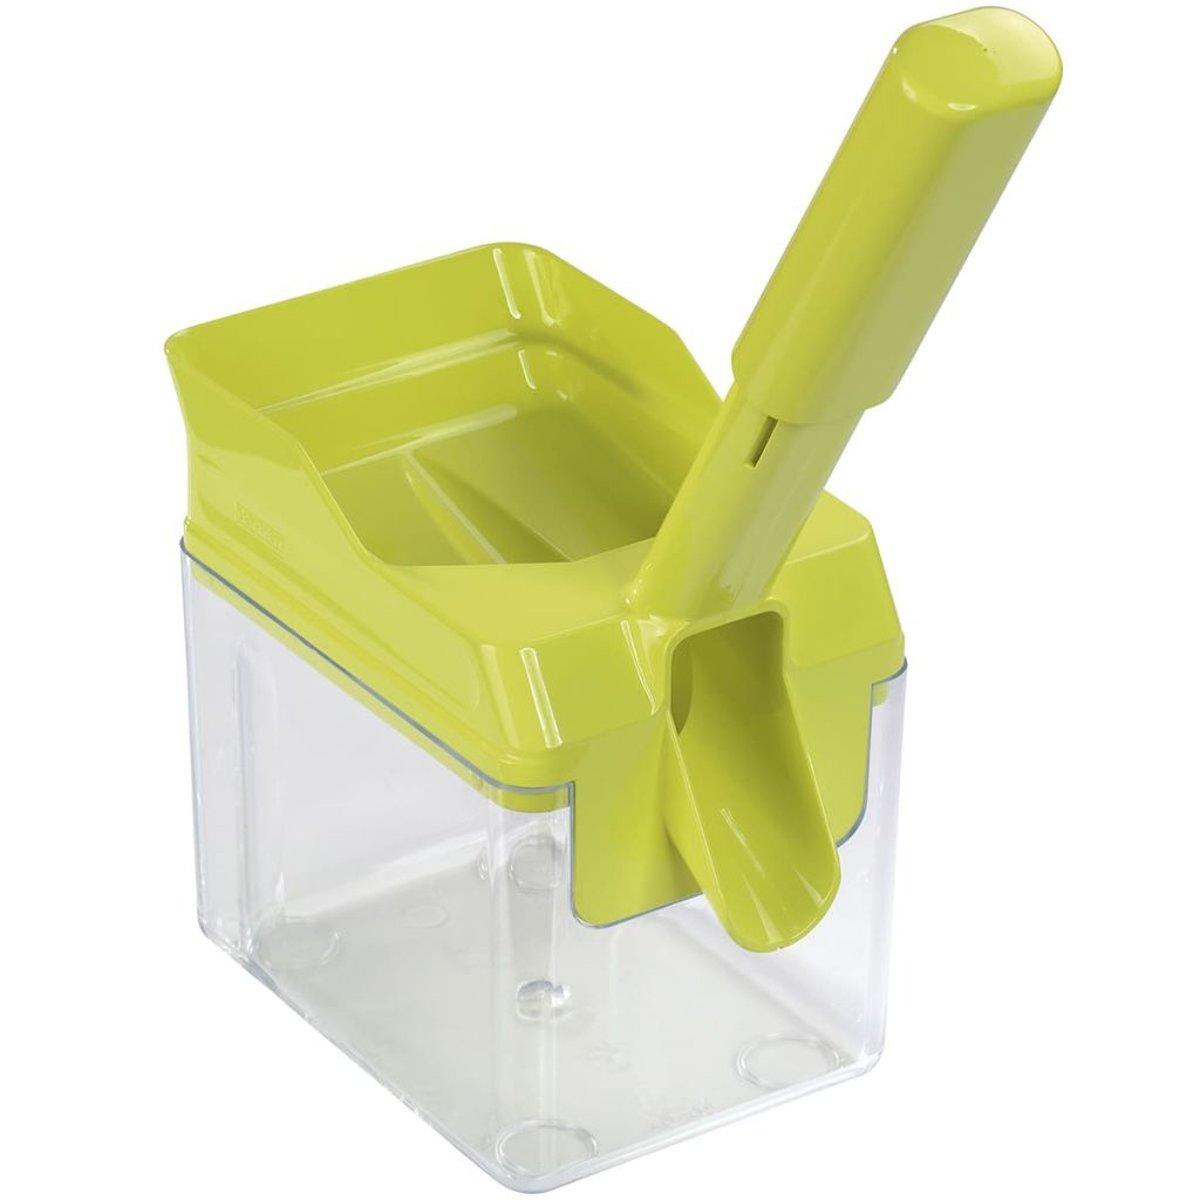 LEIFHEIT 37209 Houseware food separator huishoudartikel & -accessoire Leifheit Kersenontpitter Groen kopen